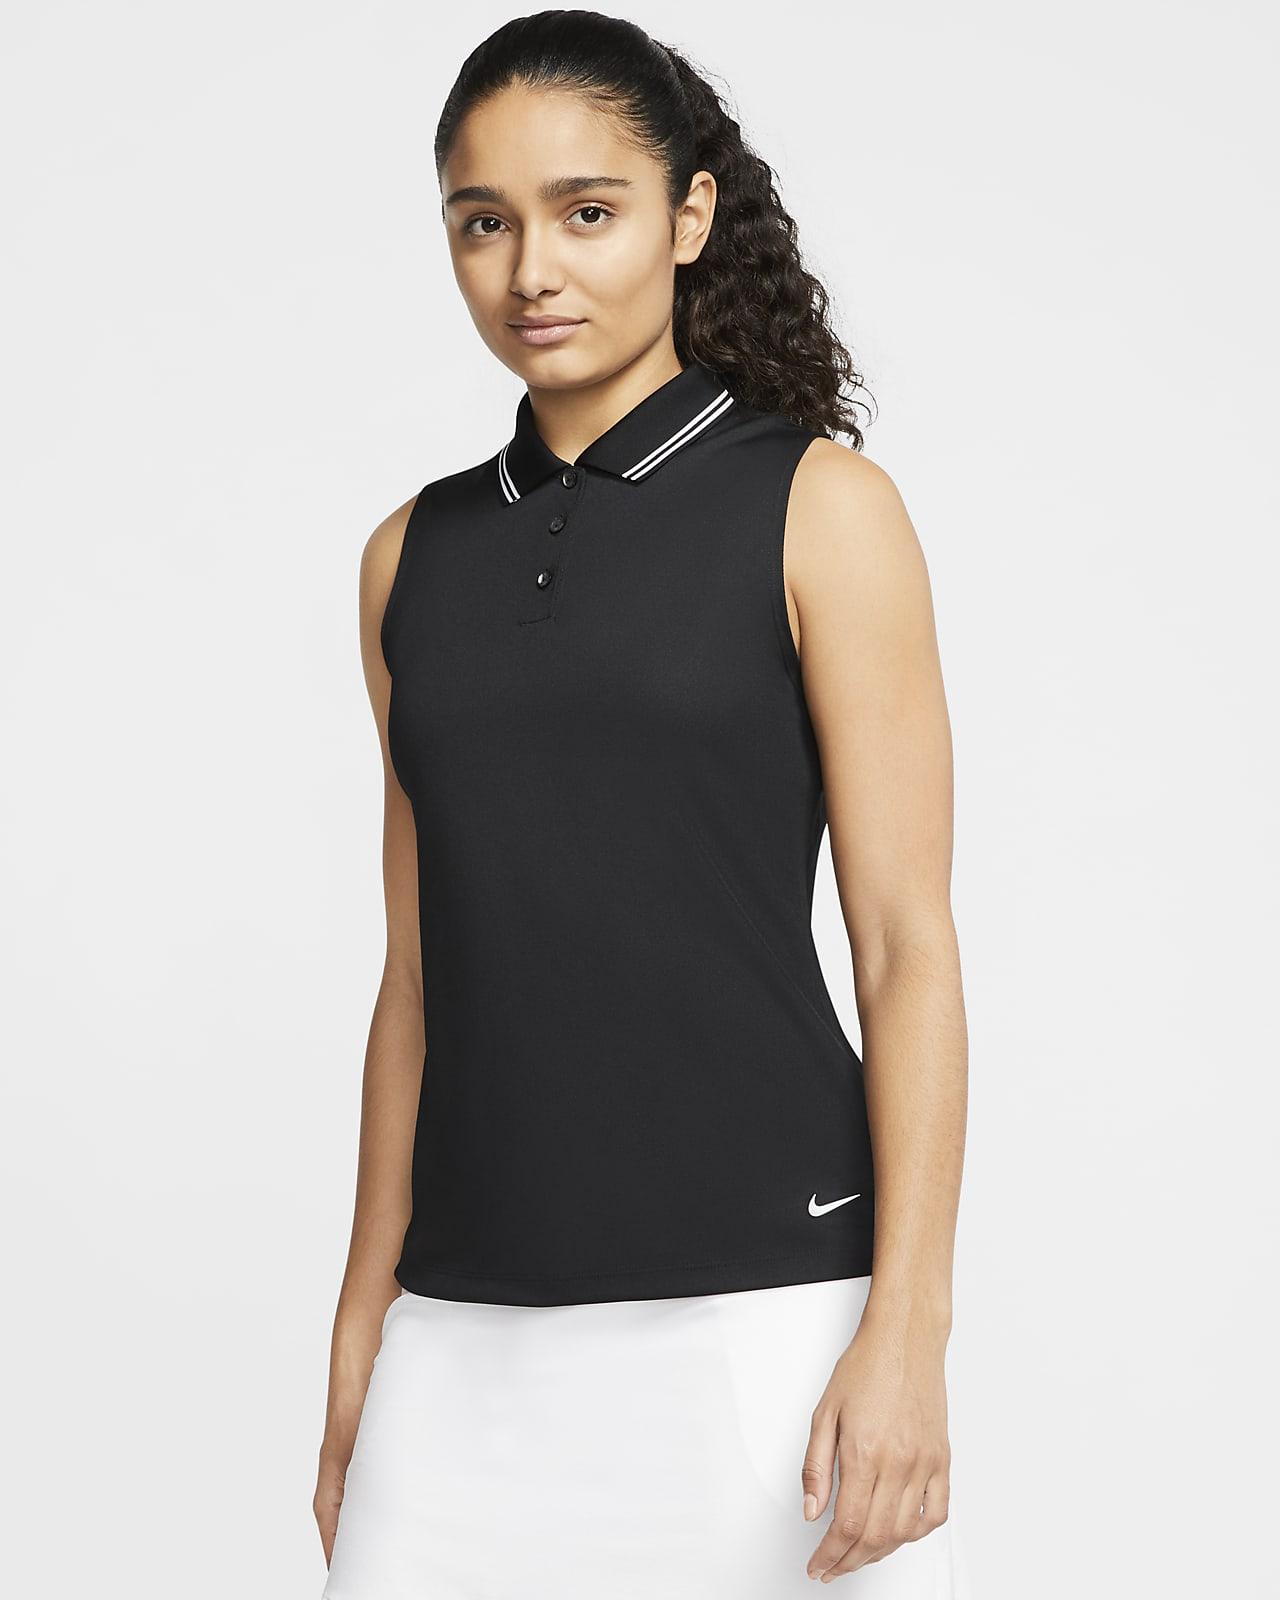 implícito Chimenea Cumplimiento a  Nike Dri-FIT Victory Women's Sleeveless Golf Polo. Nike.com